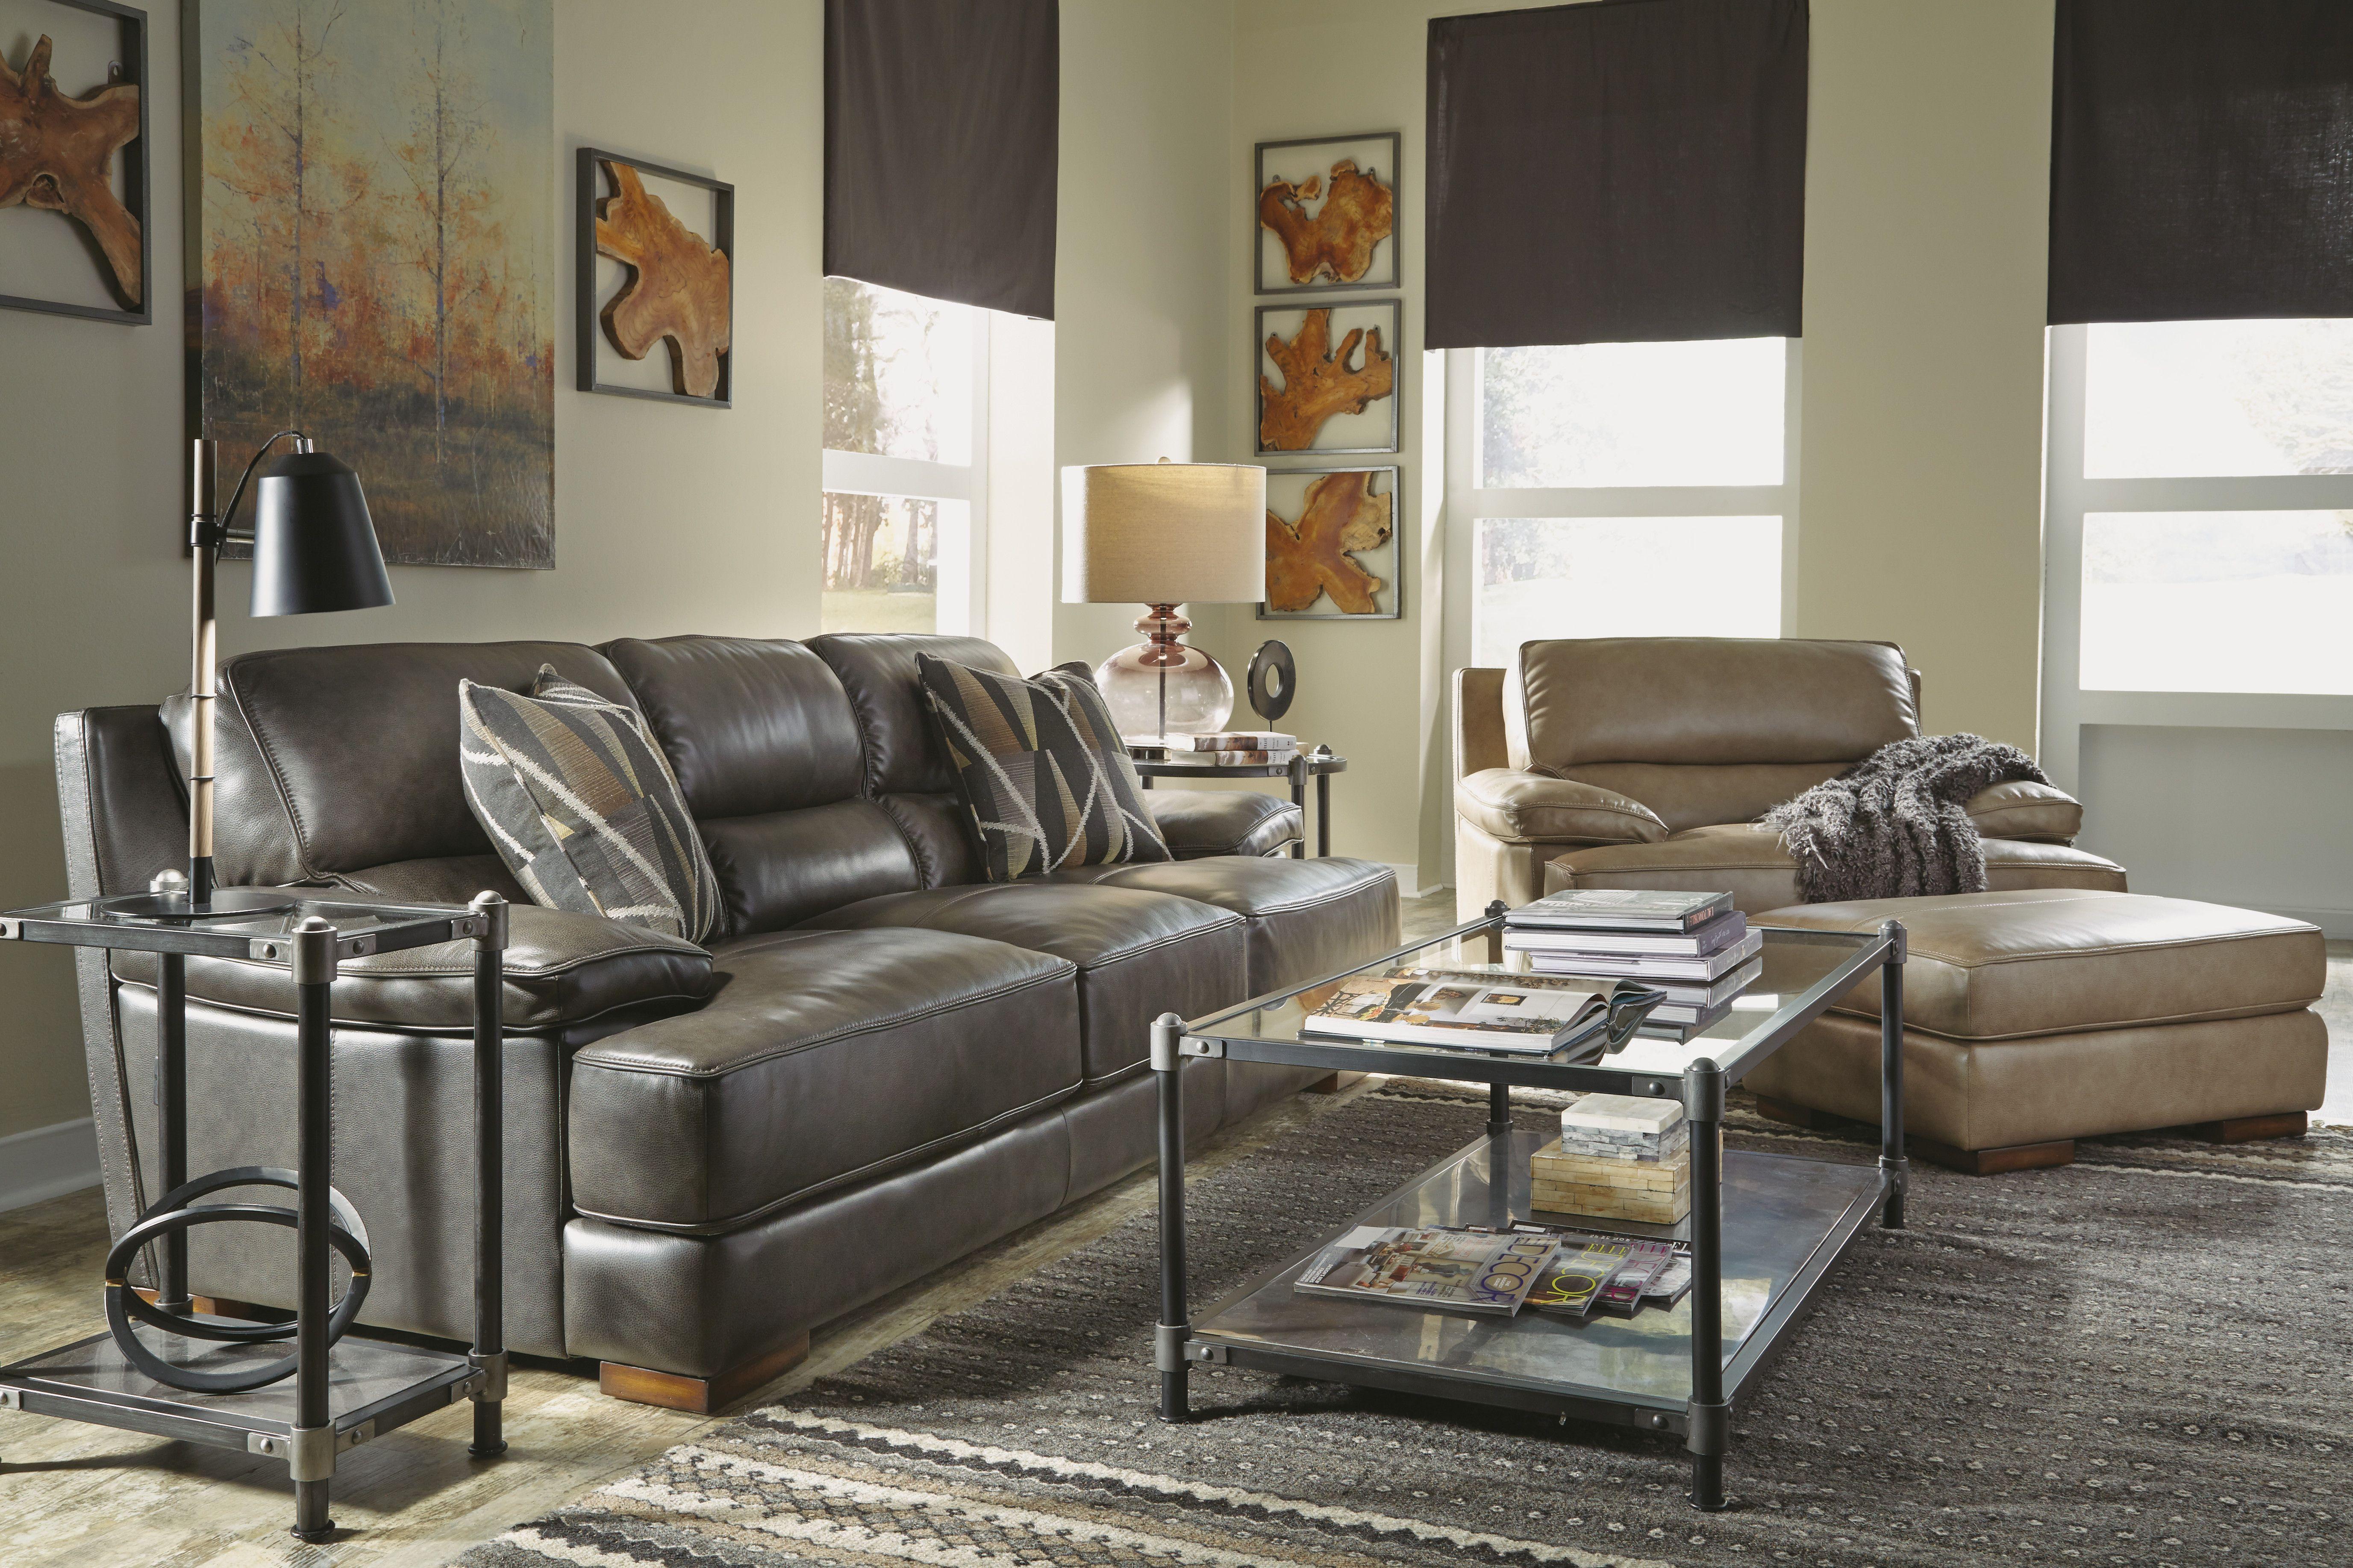 Surprising Room Design Featuring The Jade By Flexsteel Furniture Unemploymentrelief Wooden Chair Designs For Living Room Unemploymentrelieforg